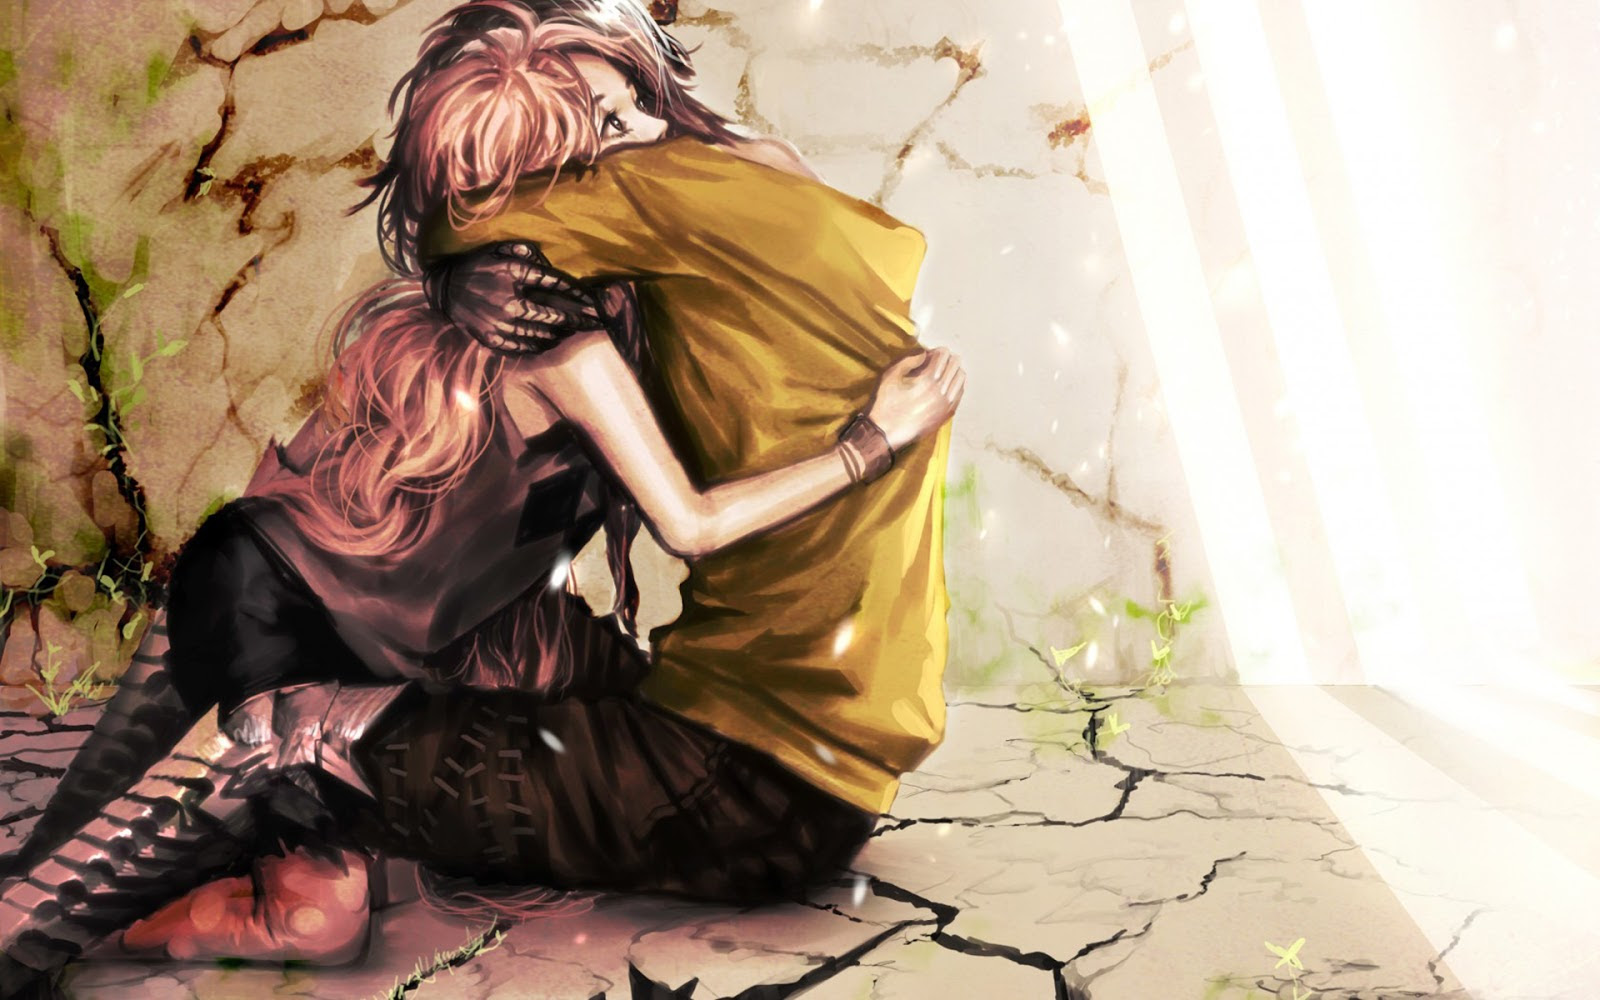 870+ Wallpaper Love Couple Romantic Anime HD Terbaru